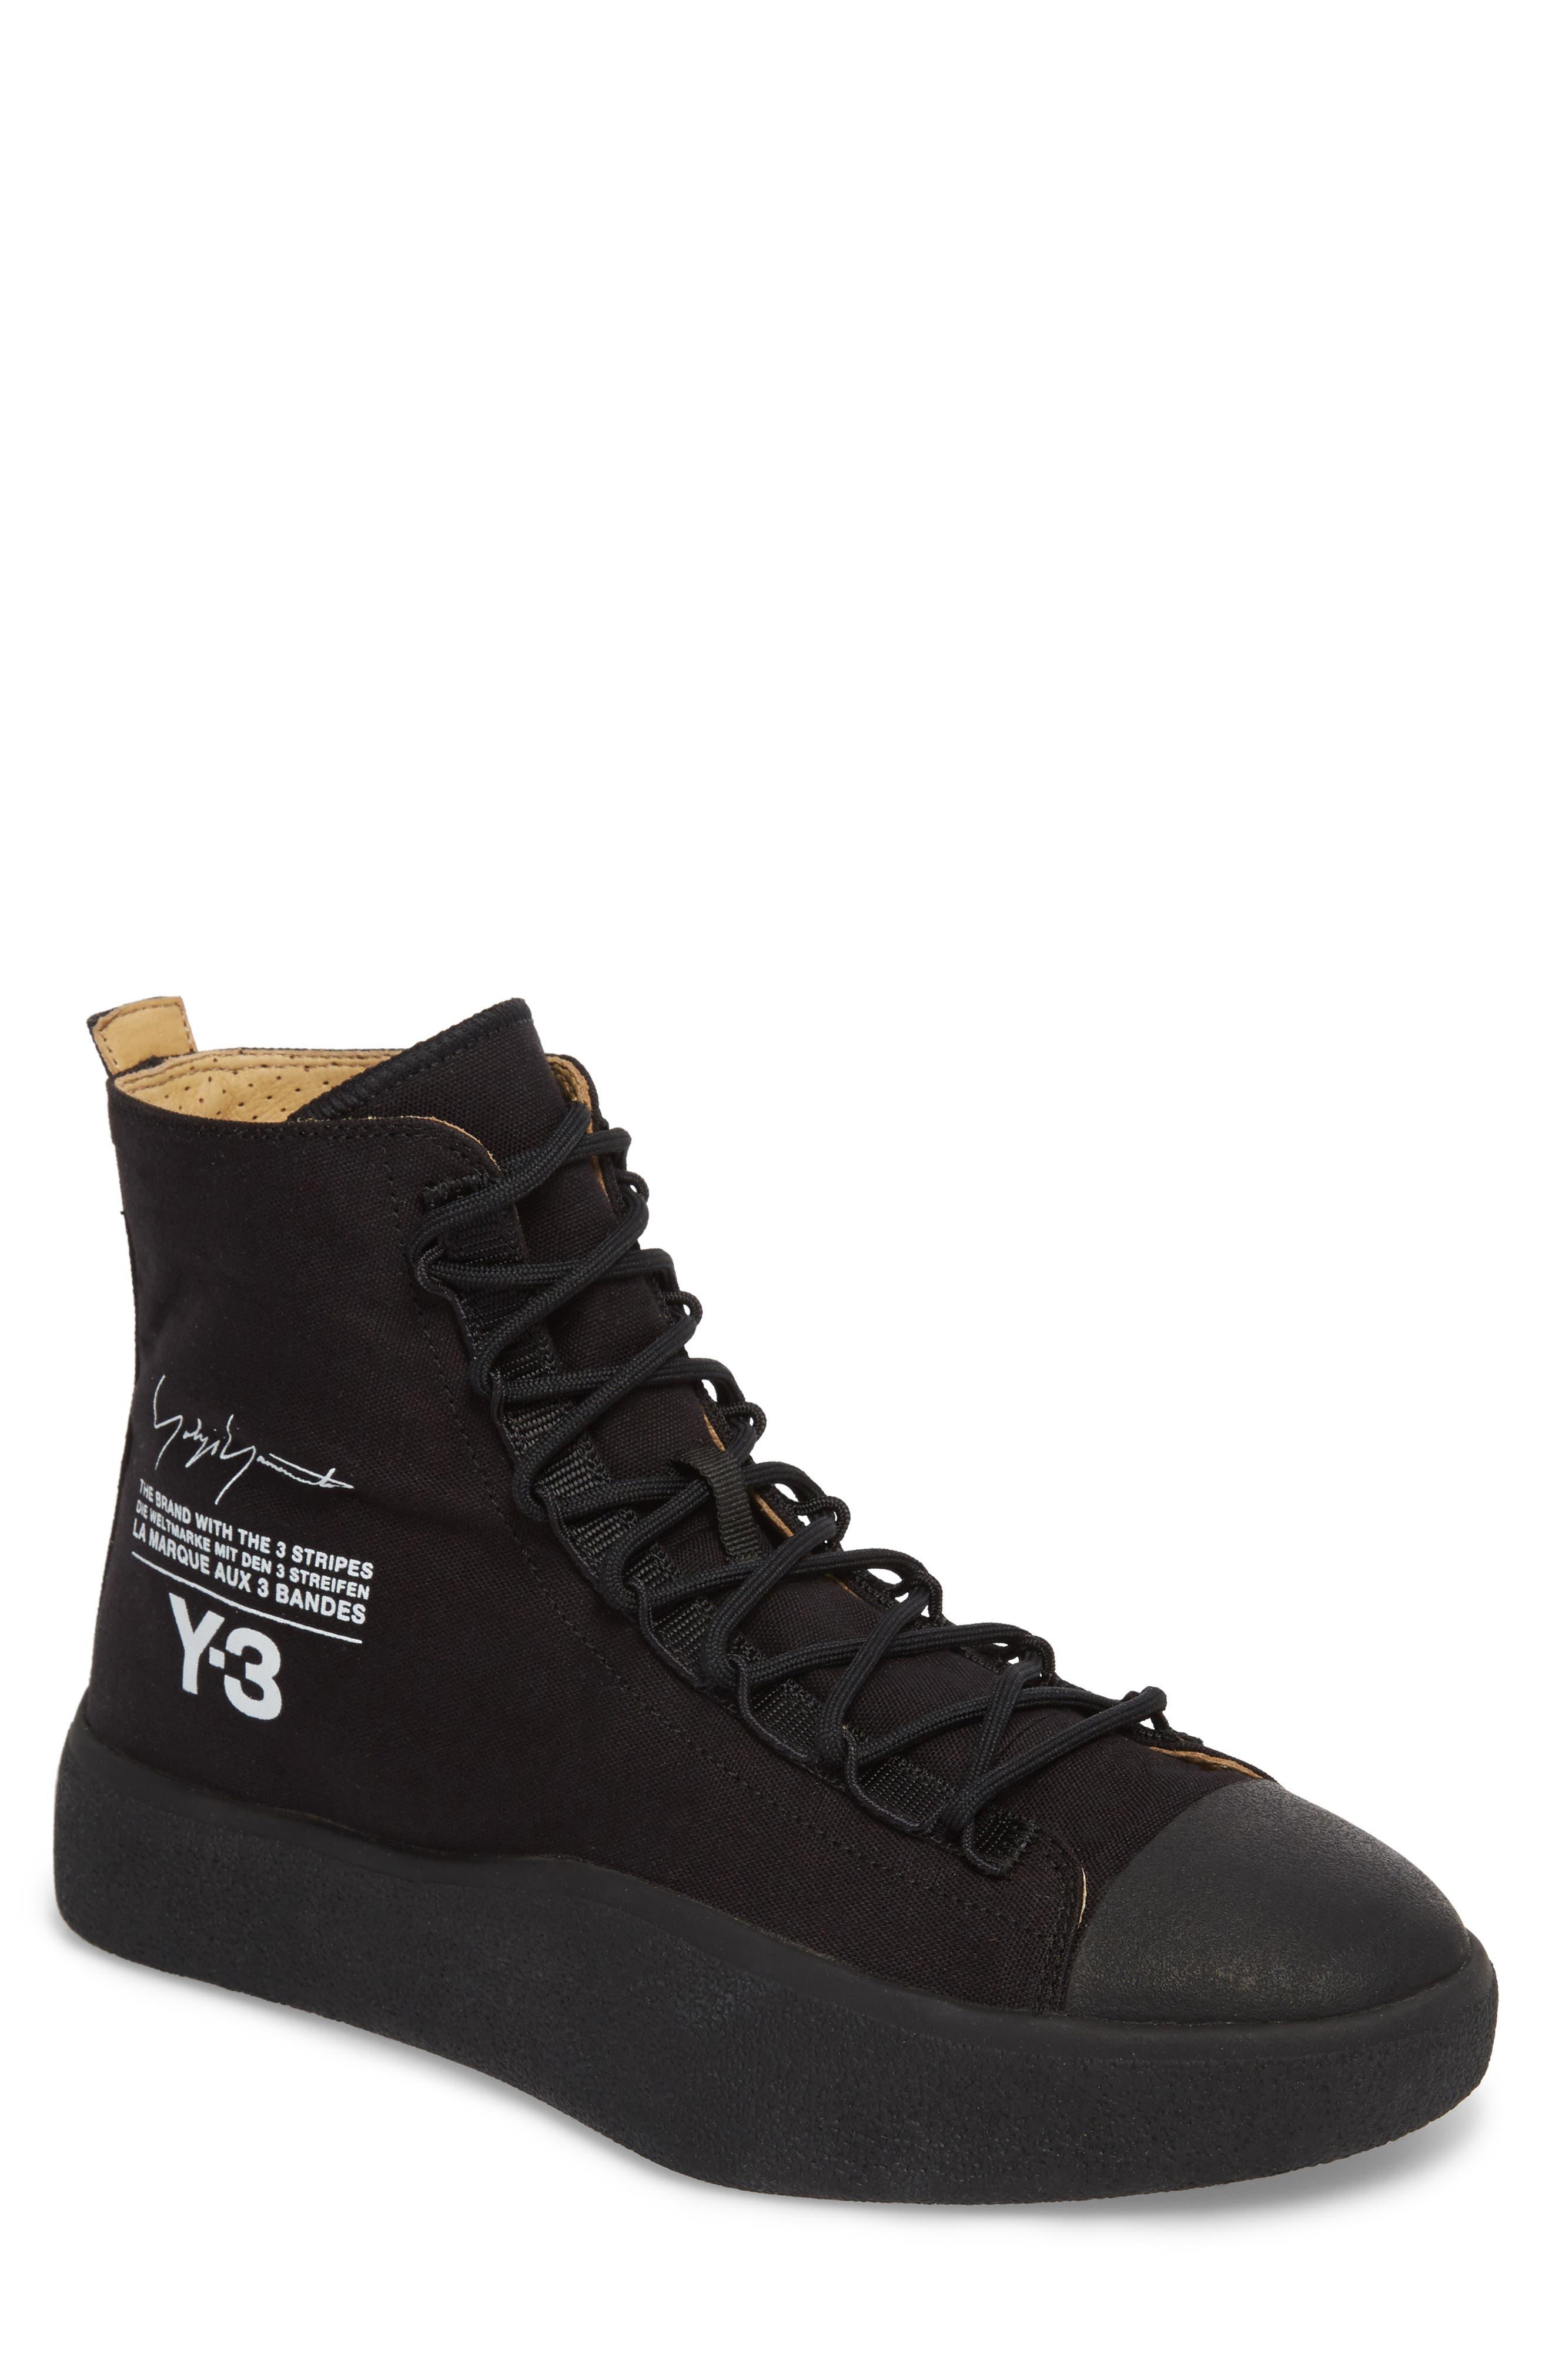 x adidas Bashyo High Top Sneaker,                         Main,                         color, Black